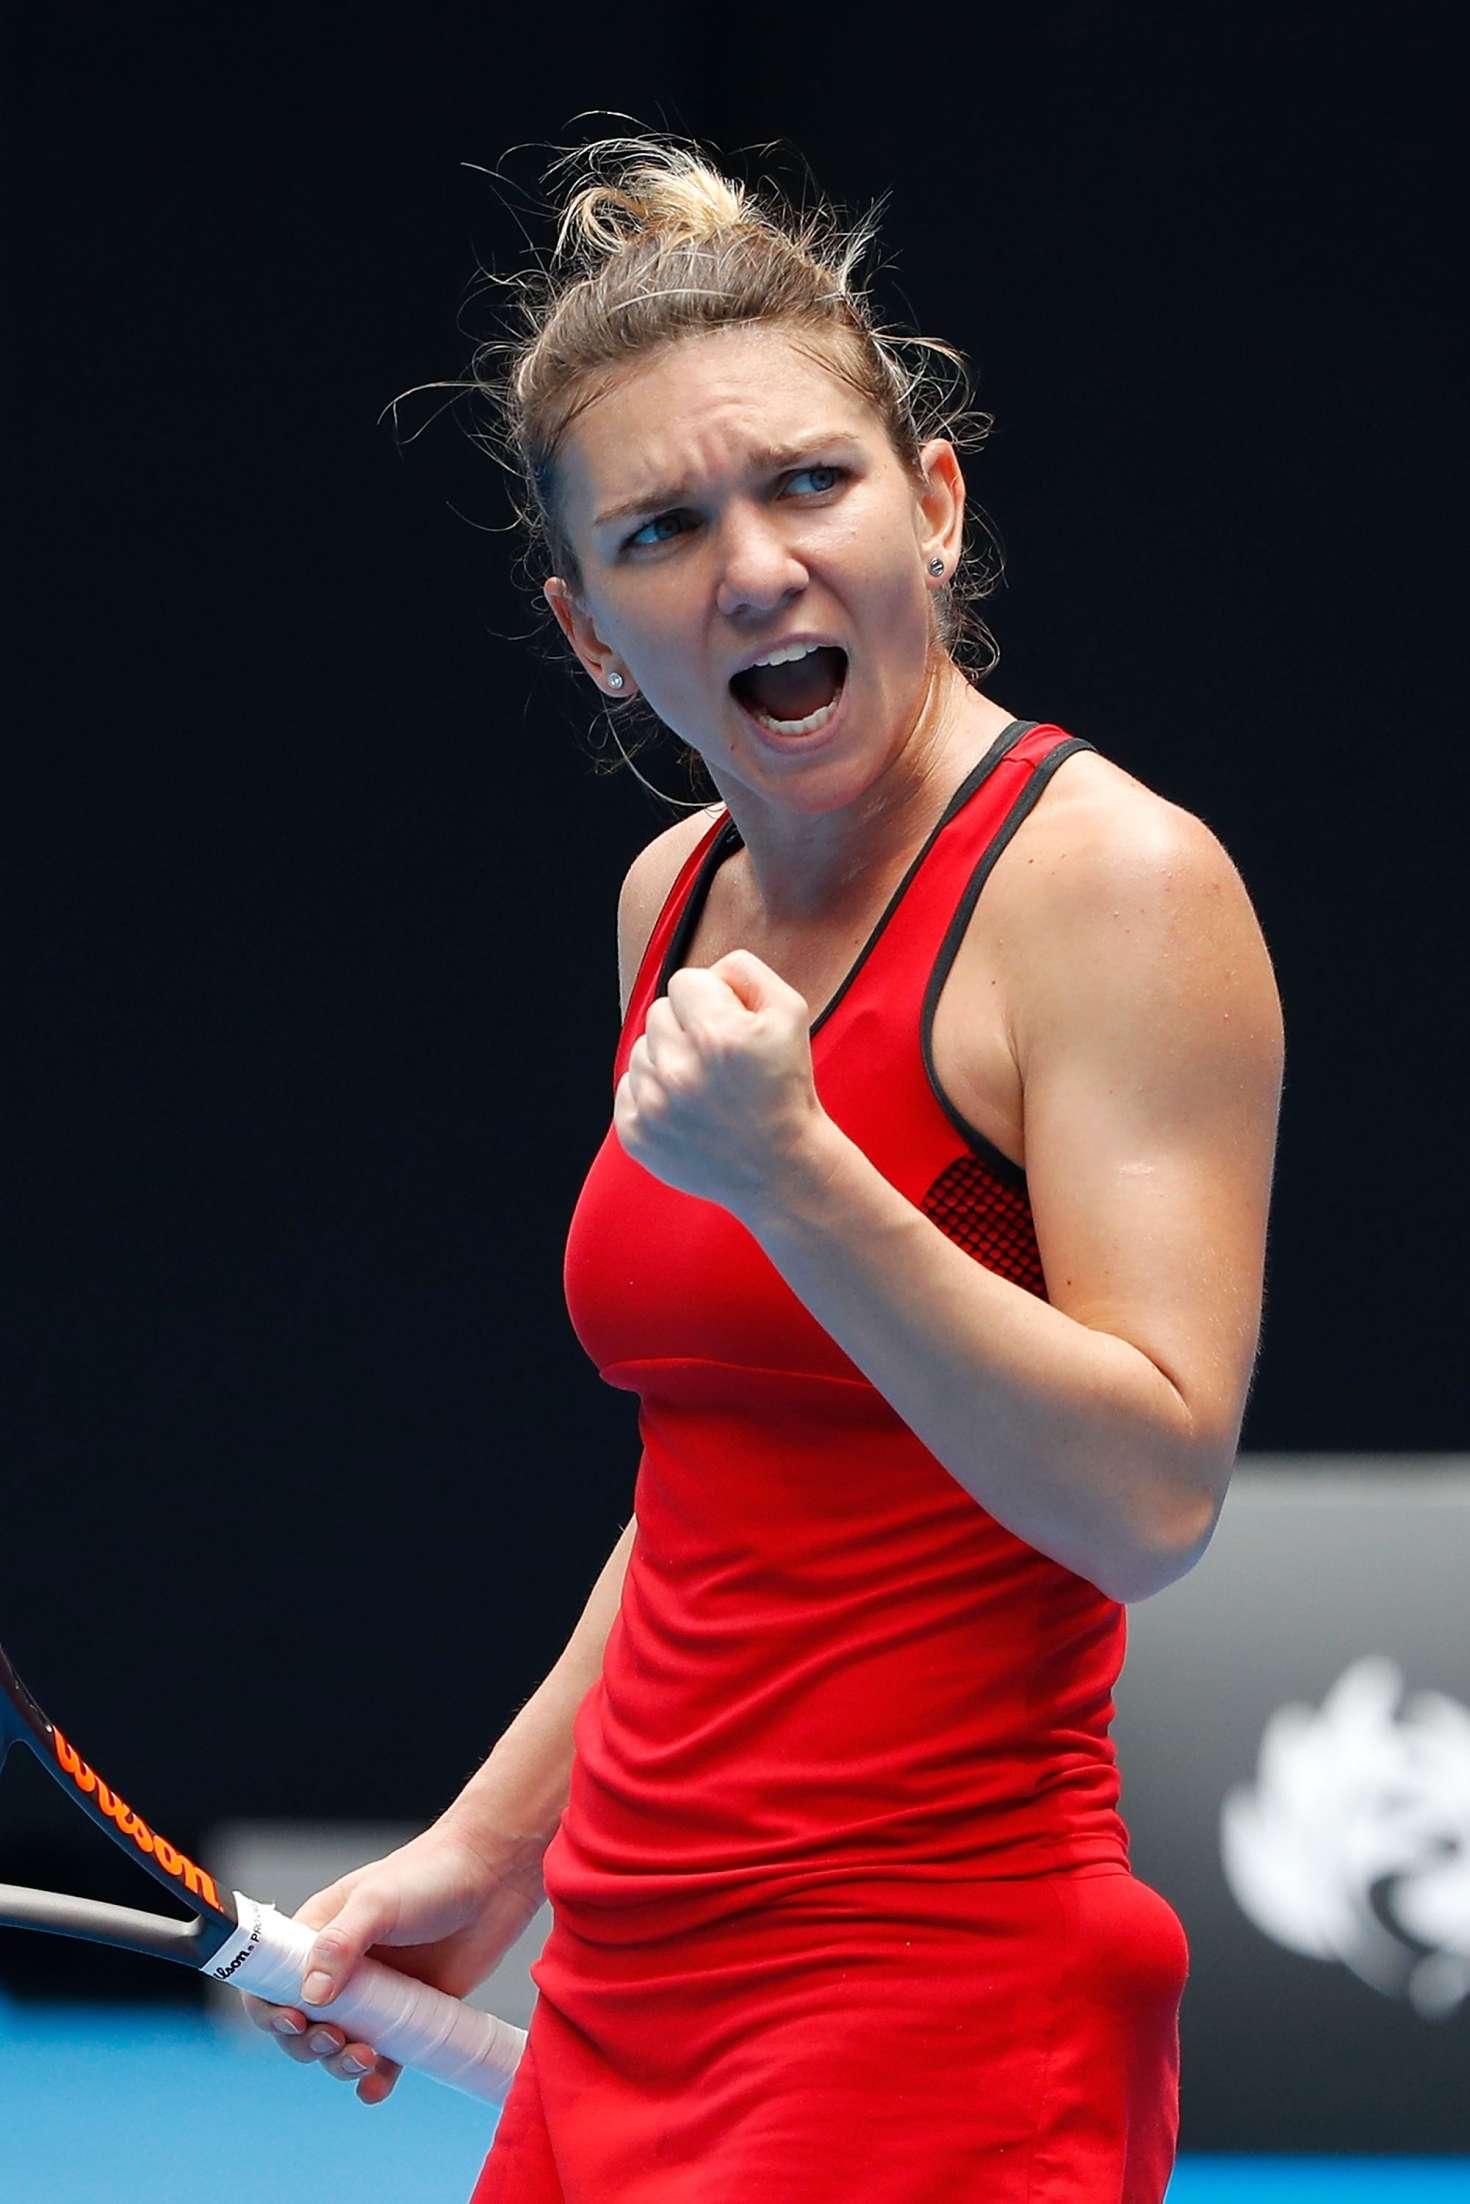 Simona Halep - 2020 Australian Open 01/21/2020 • CelebMafia